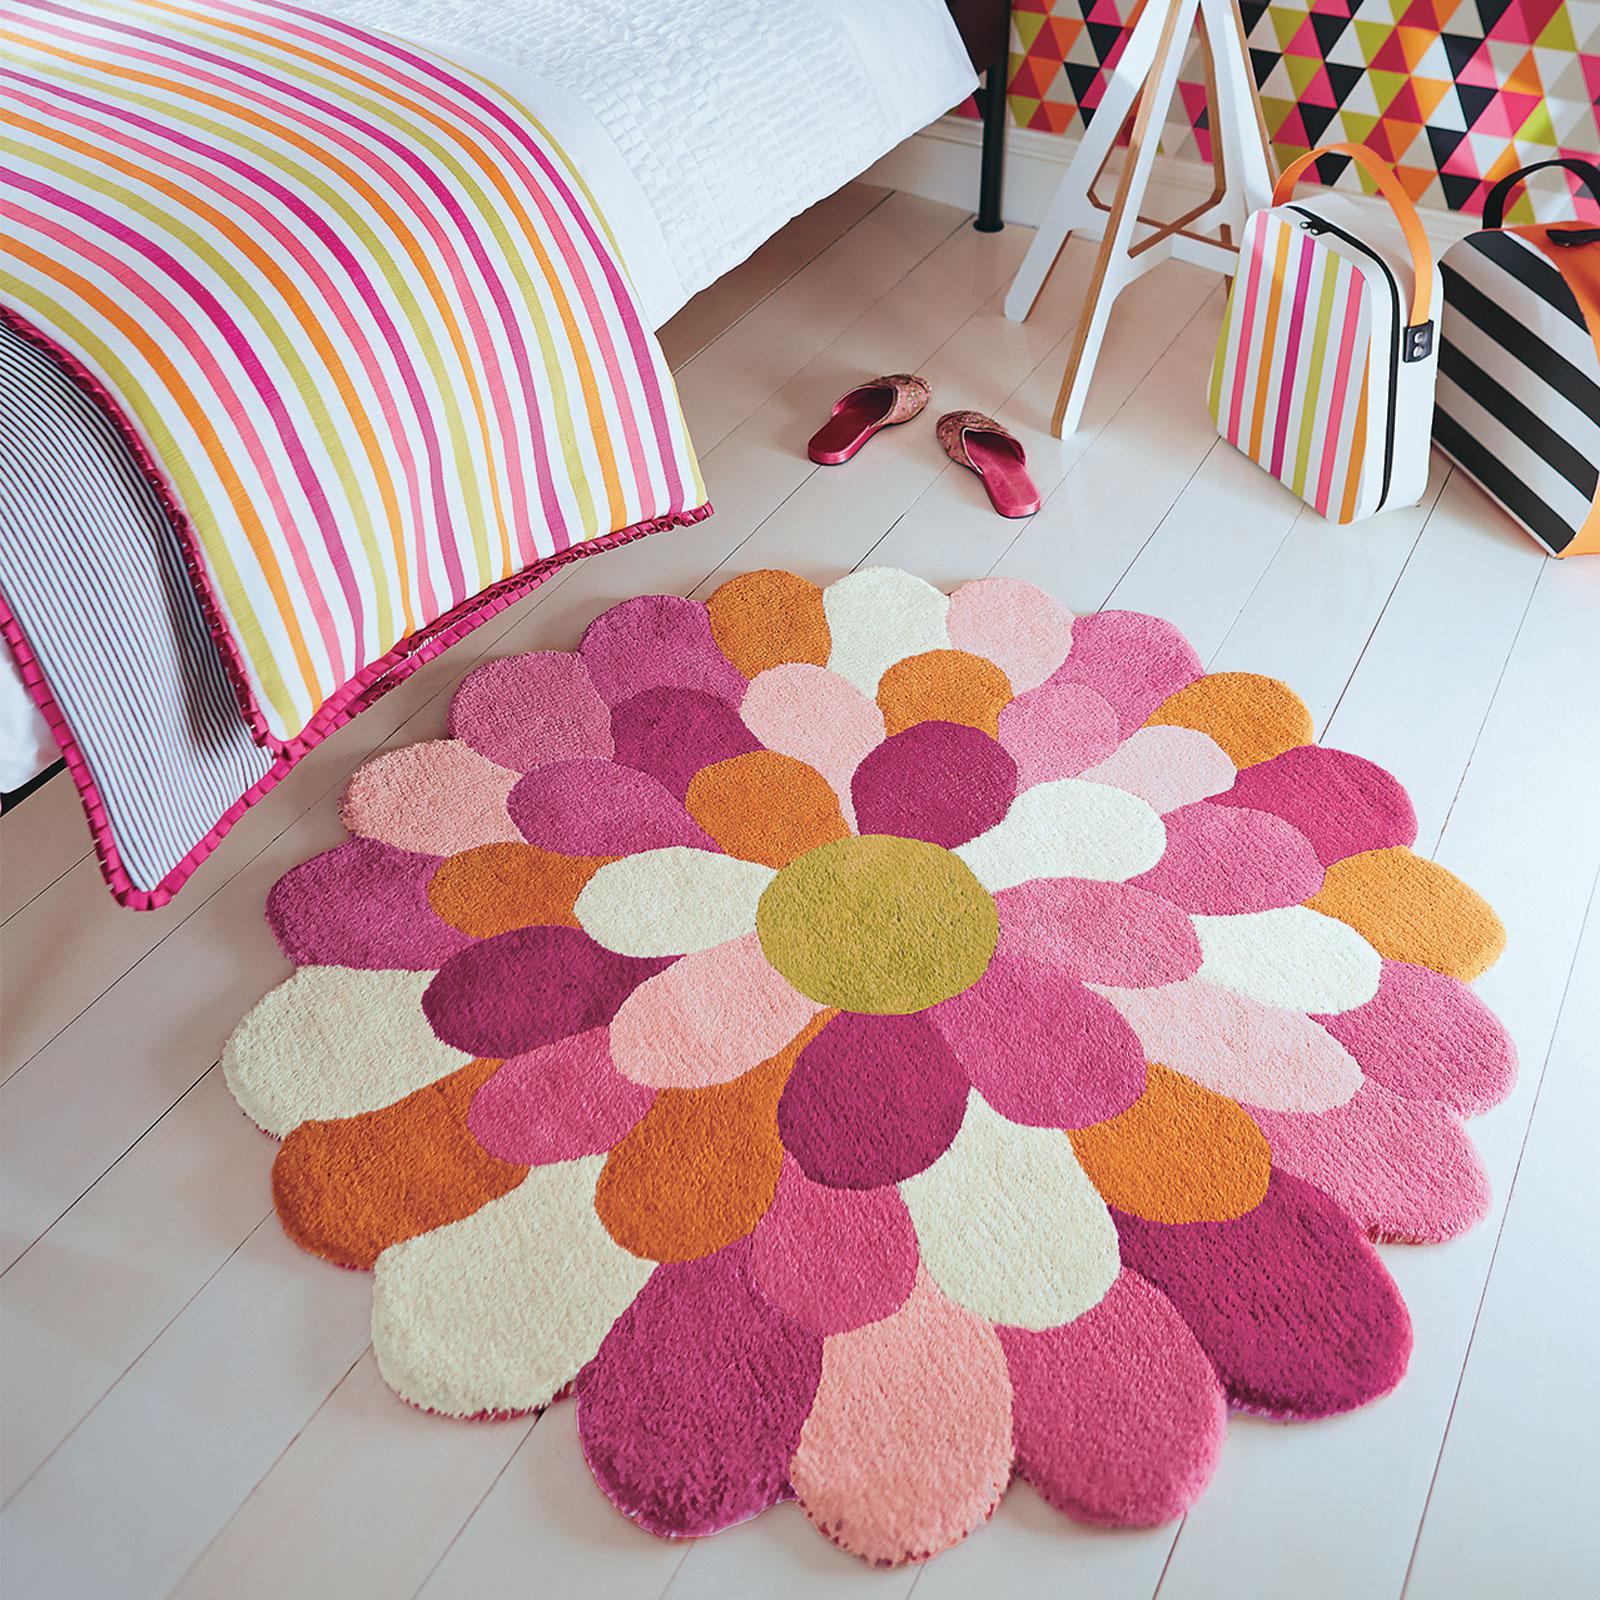 Funky Flower Rugs 42702 by Harlequin Kids